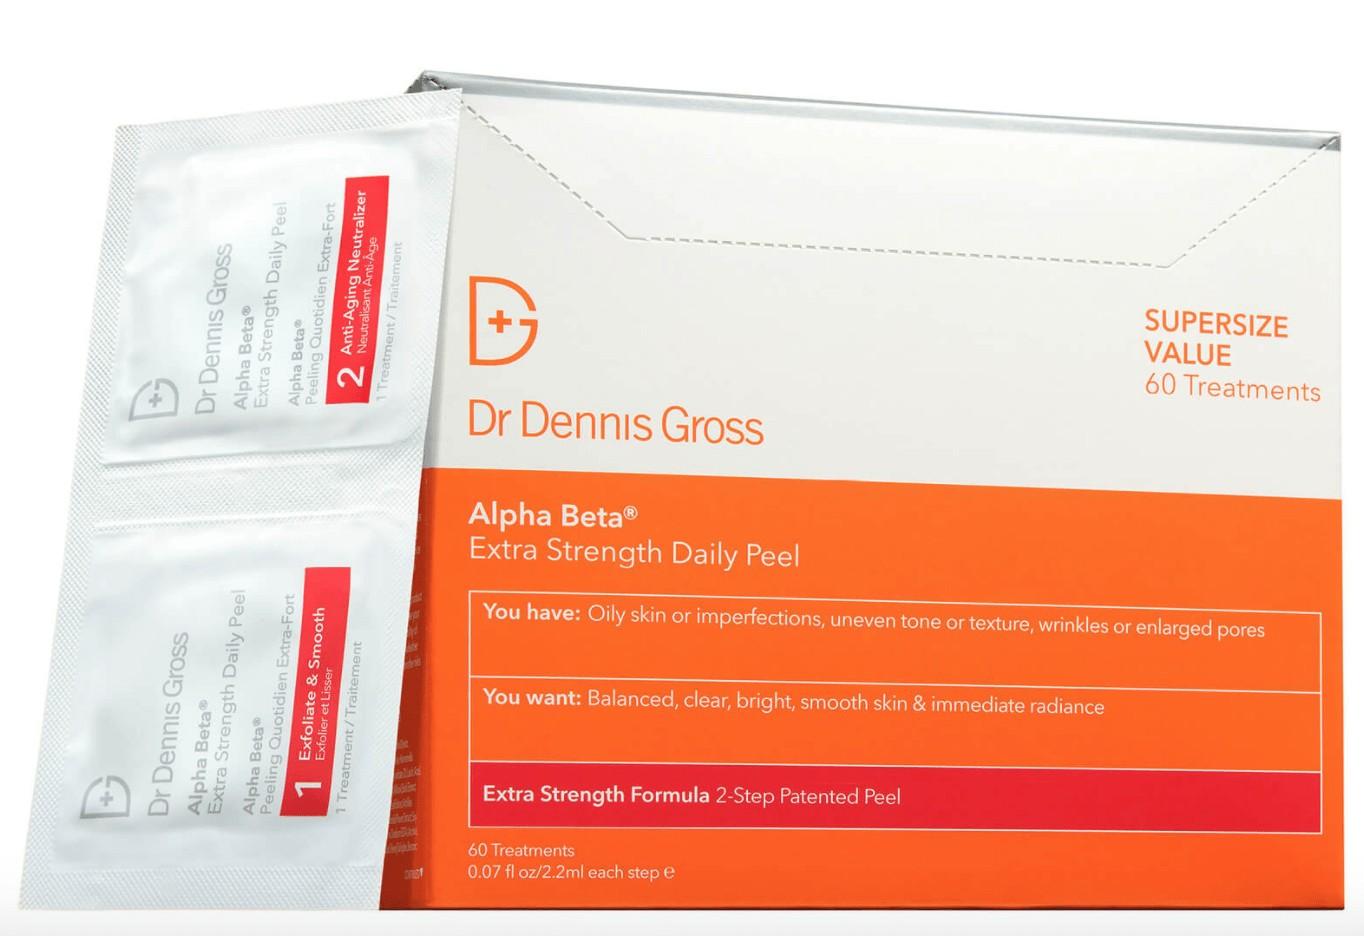 Dr. Dennis Gross Alpha Beta Peel